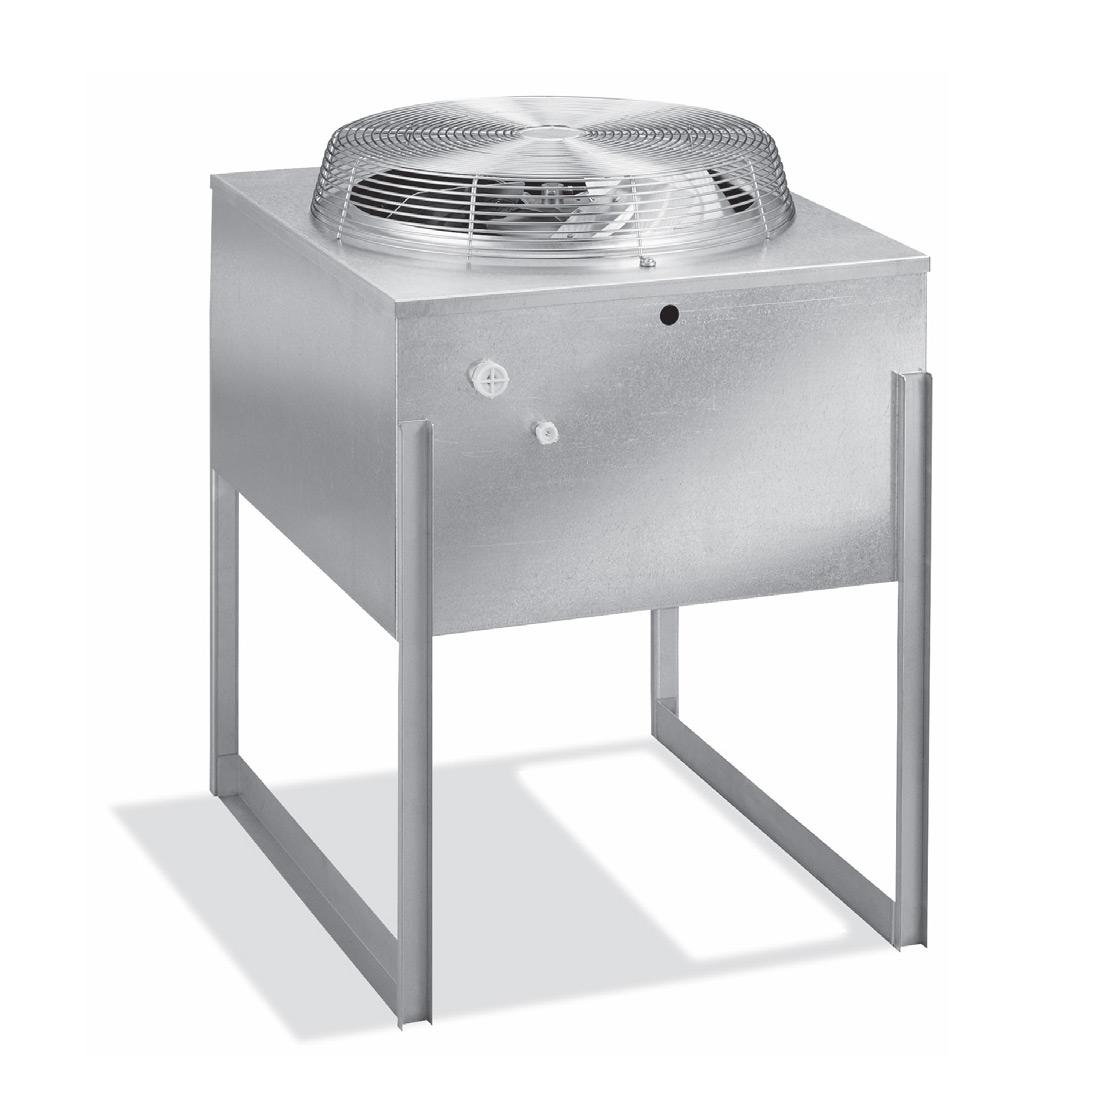 Manitowoc JCF0500 remote condenser unit